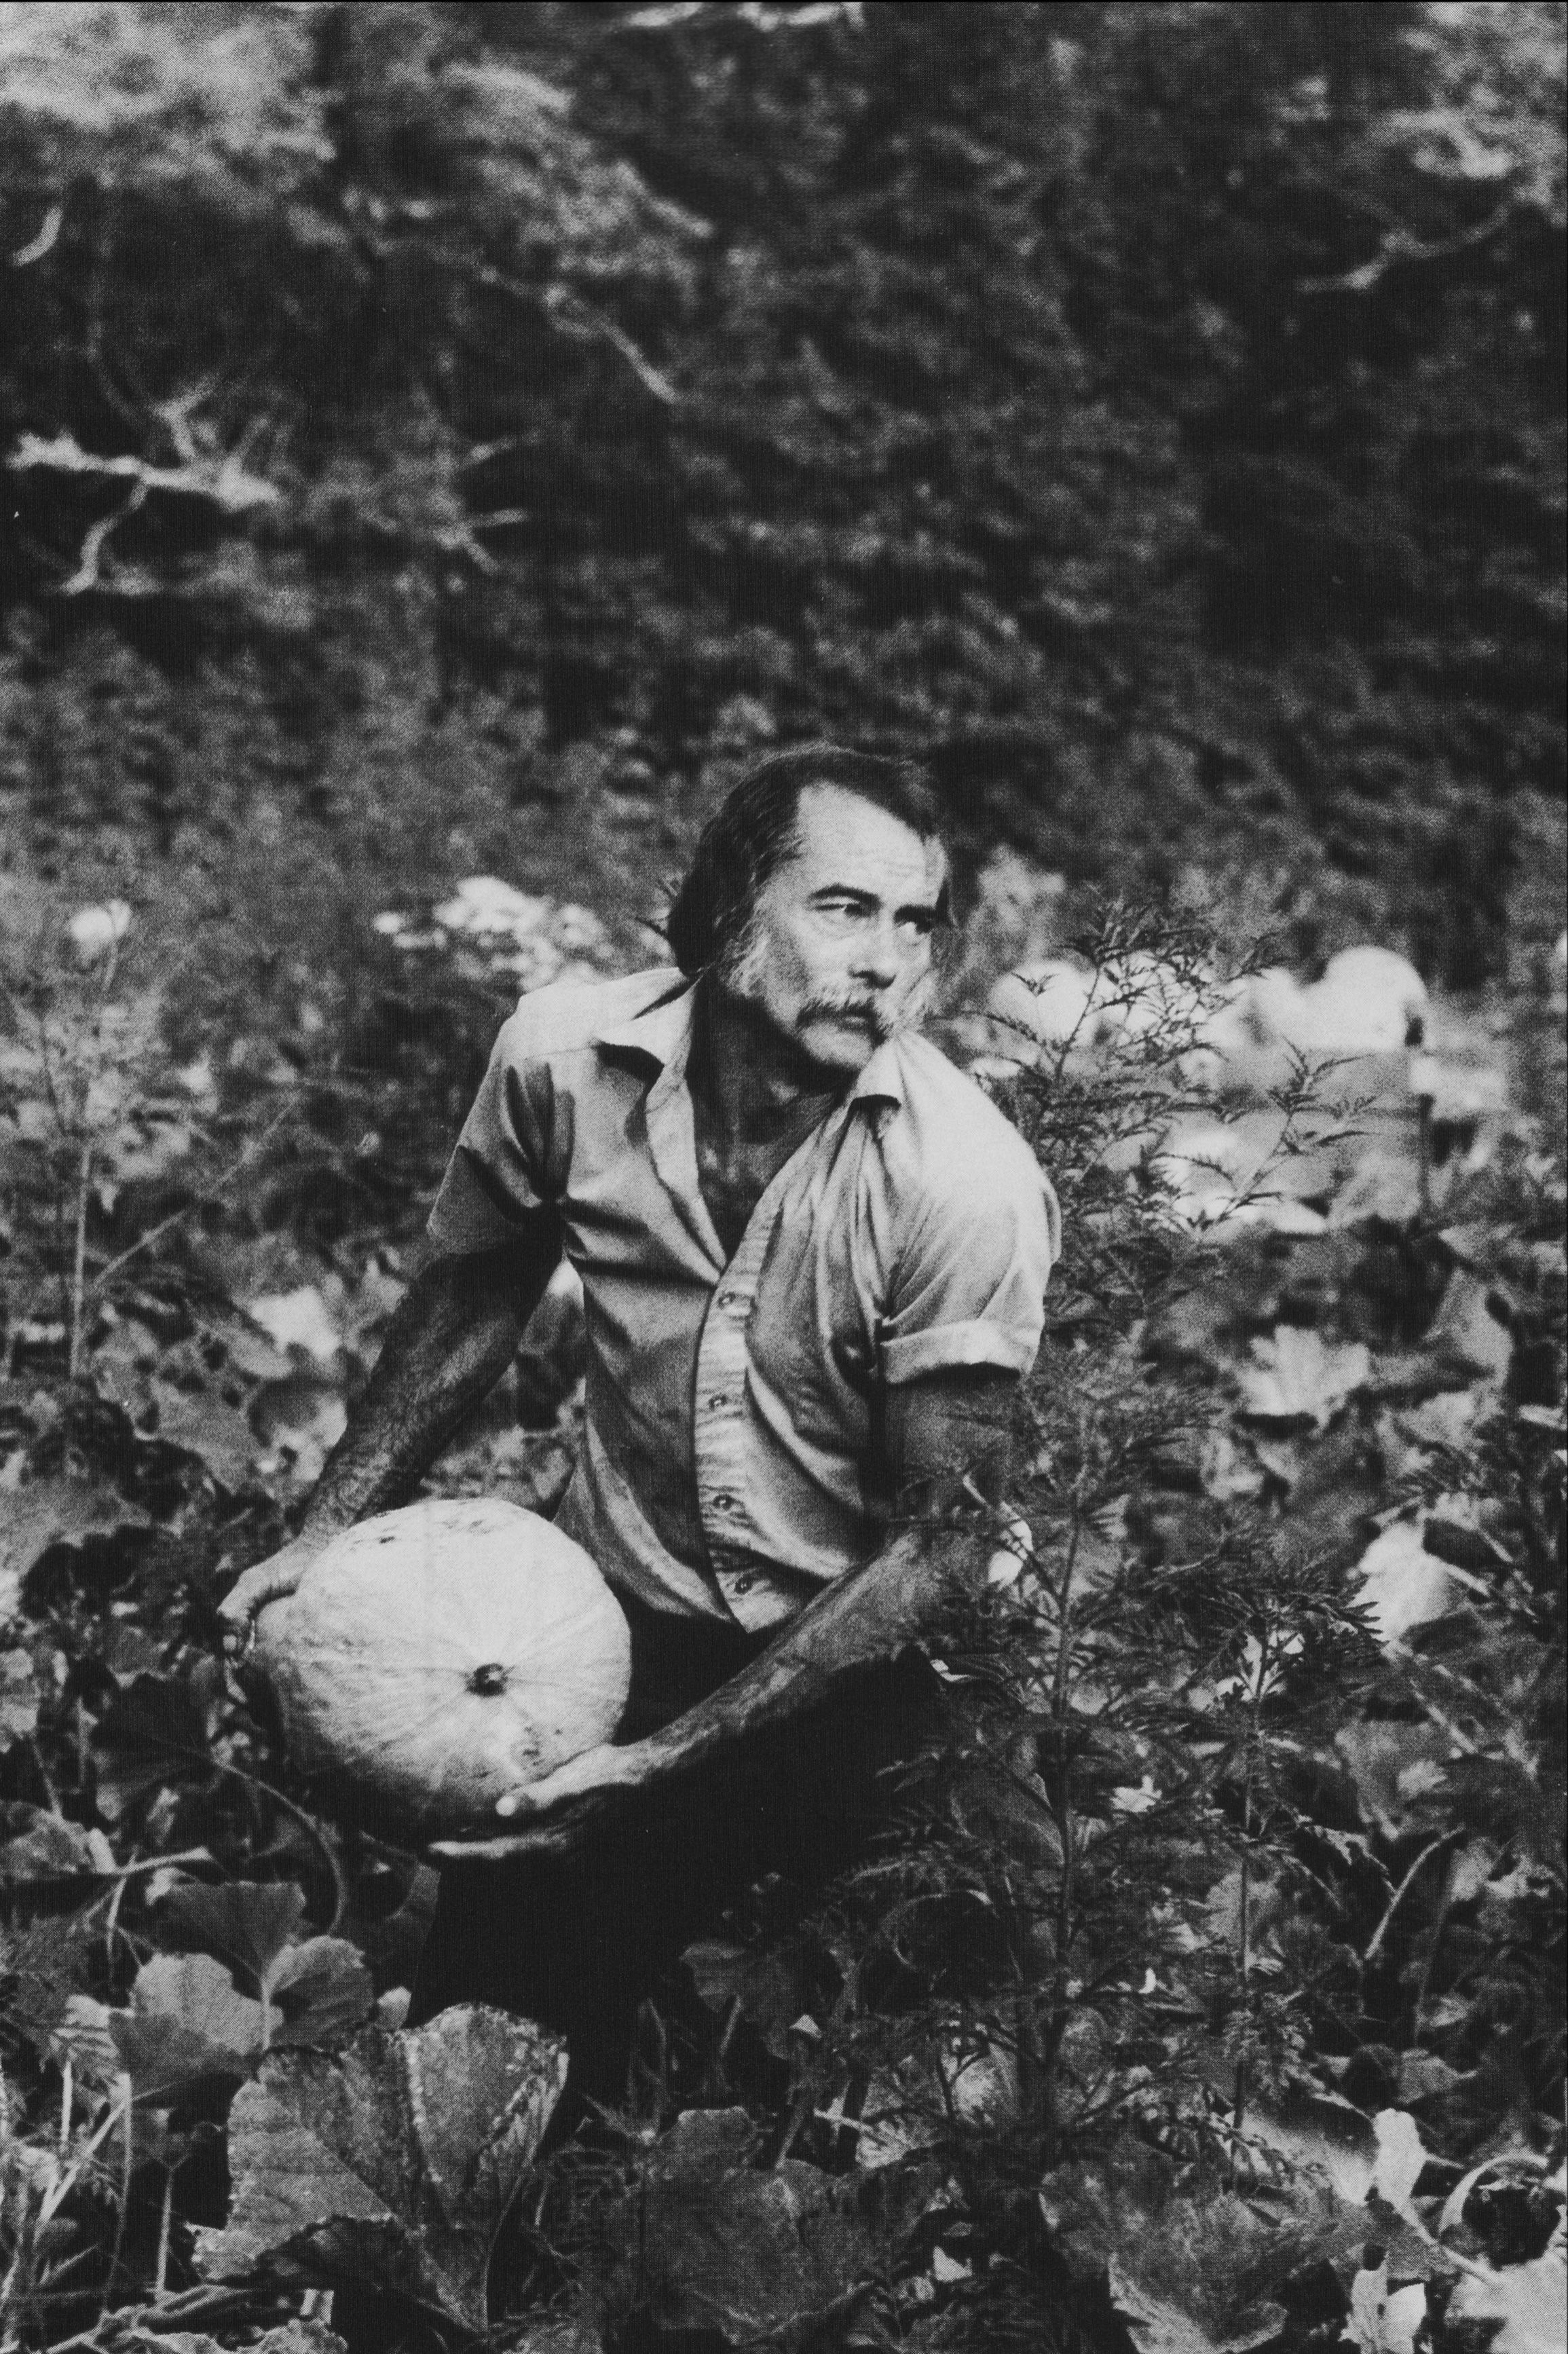 Calvin Tindal harvesting squash, Dana, NC.